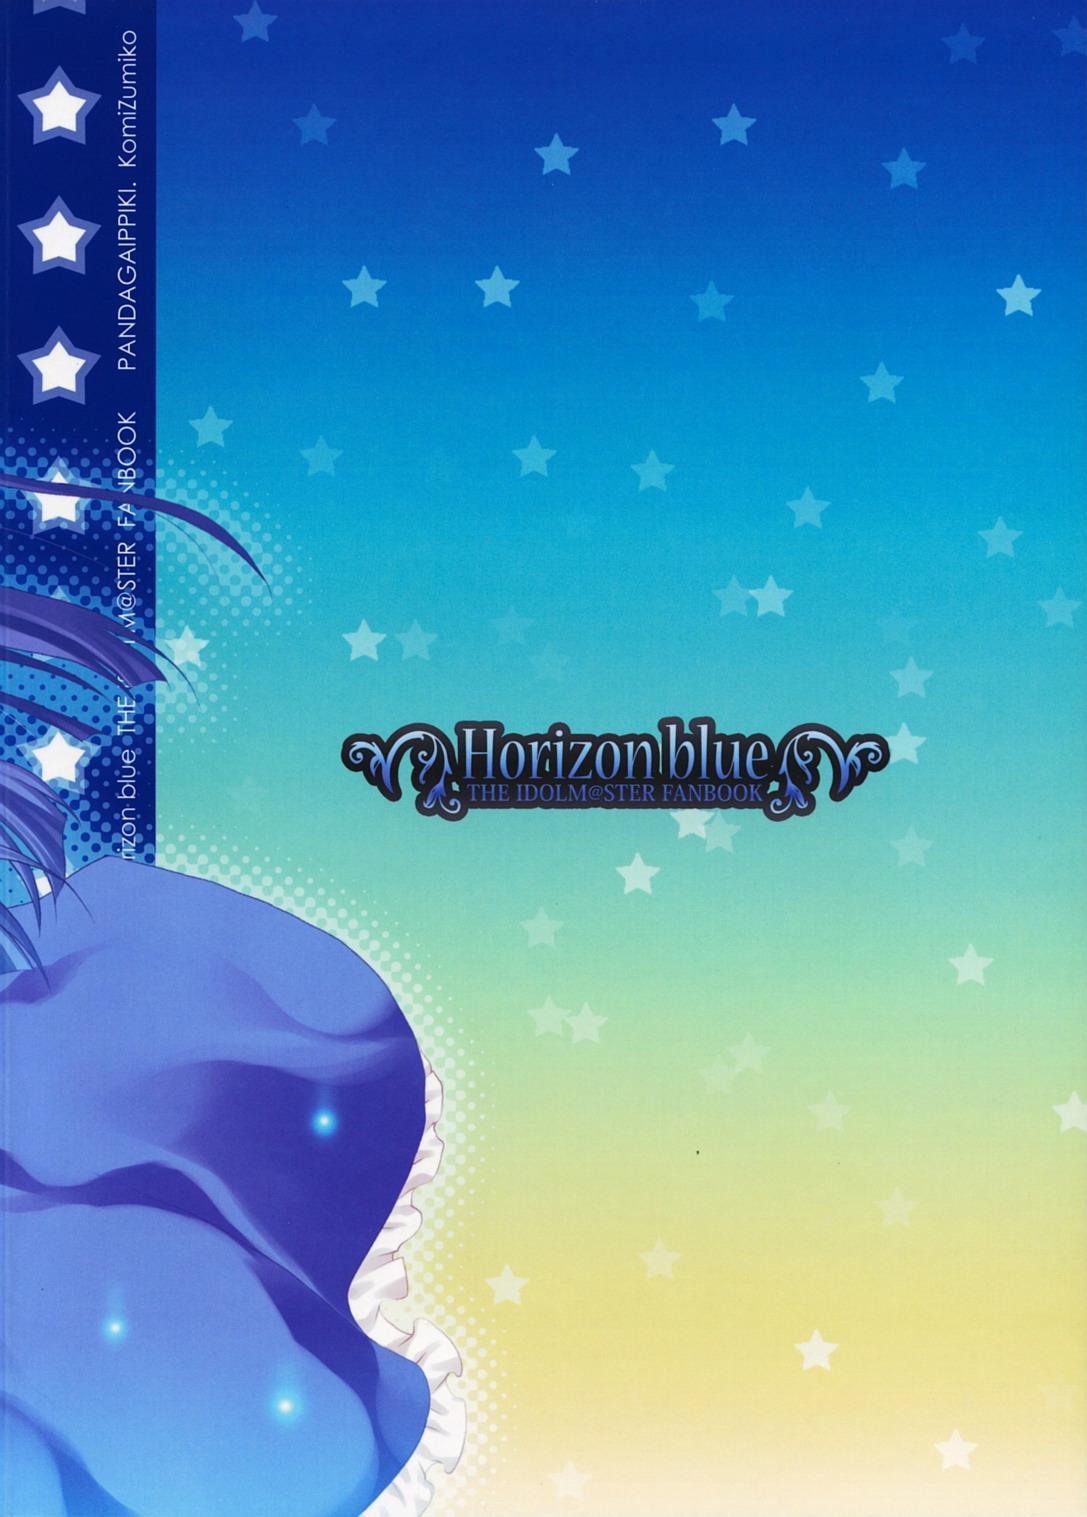 Horizon blue 34